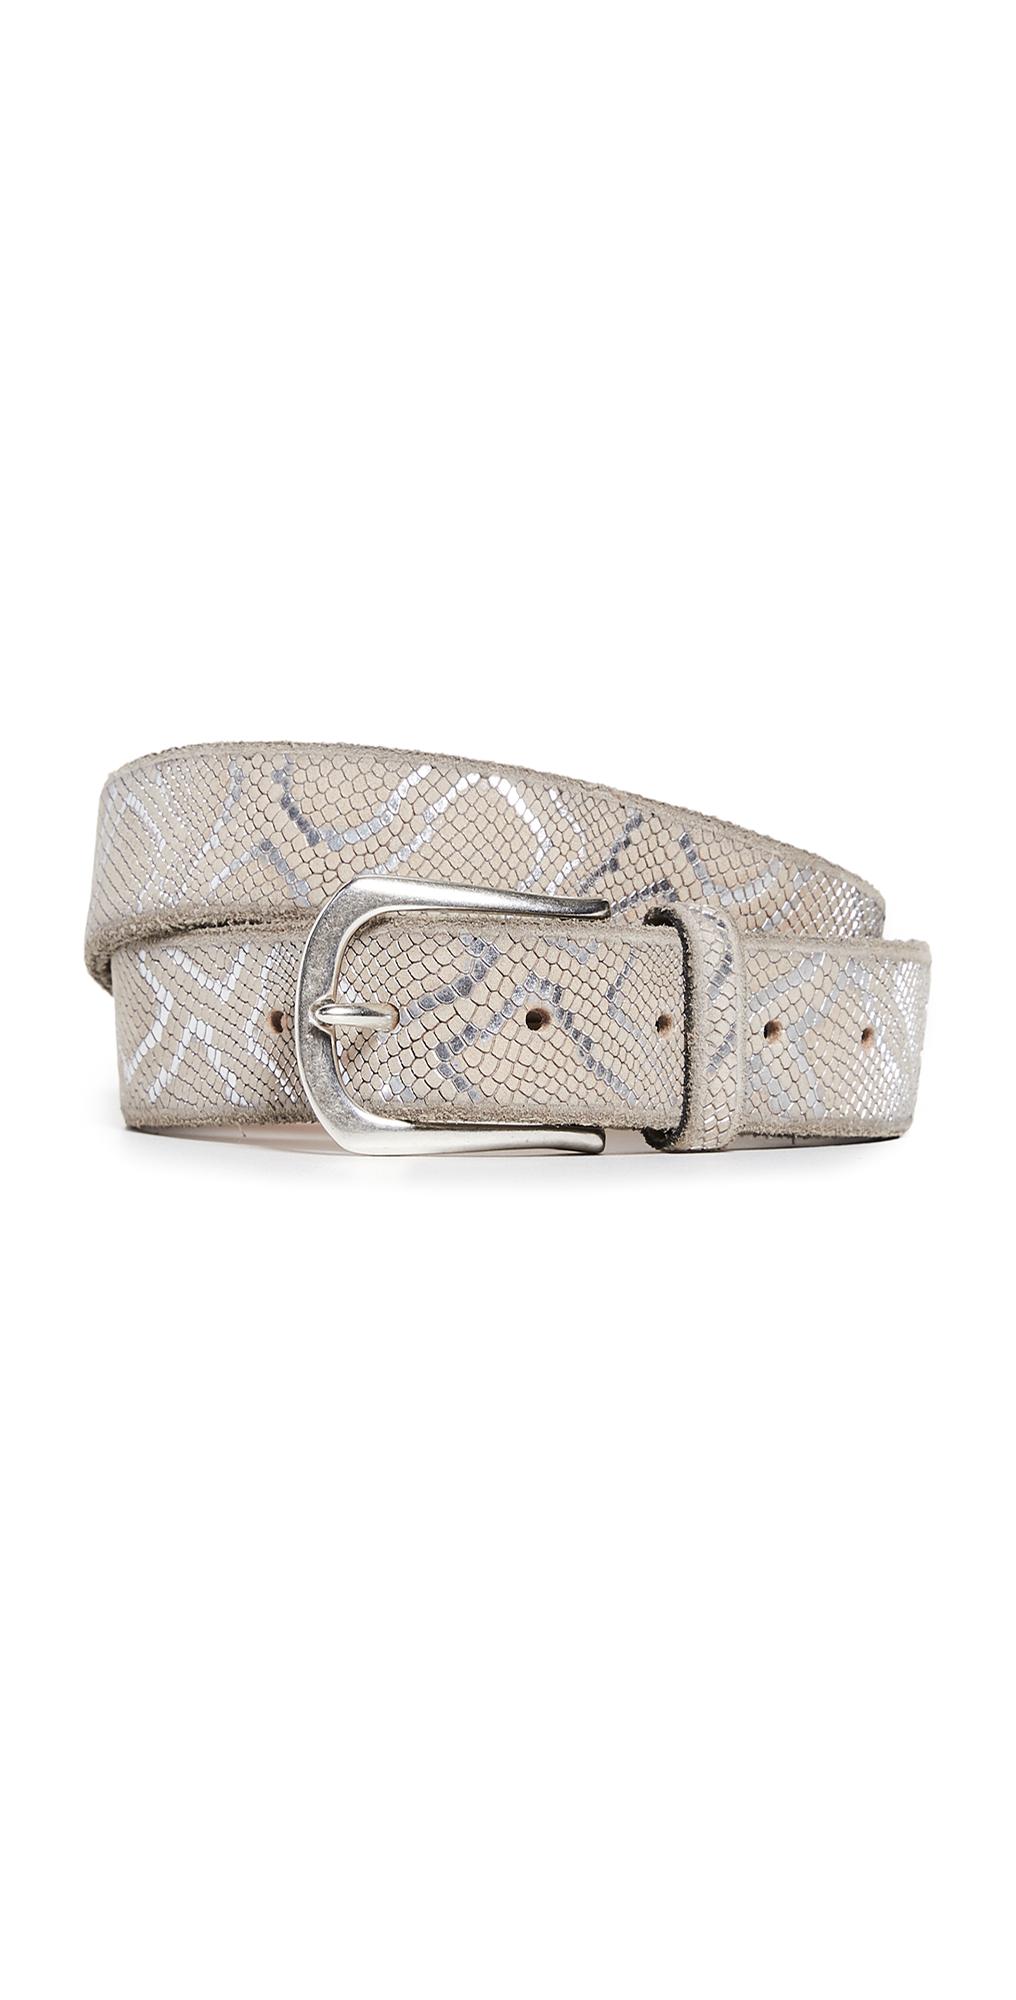 Embossed Metallic Belt